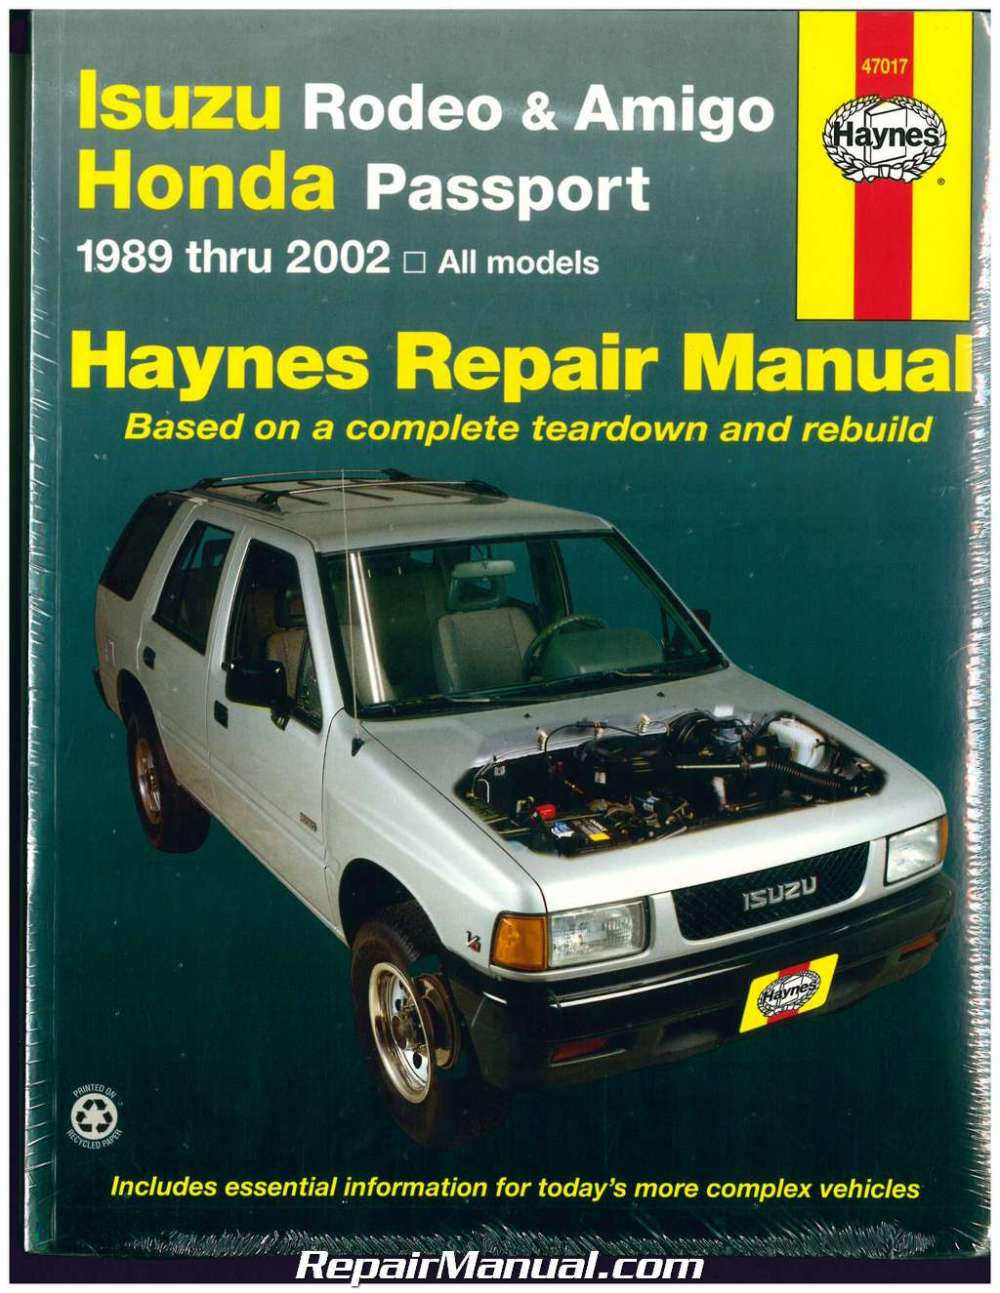 medium resolution of details about isuzu rodeo amigo honda passport 1989 2002 haynes automotive repair manual